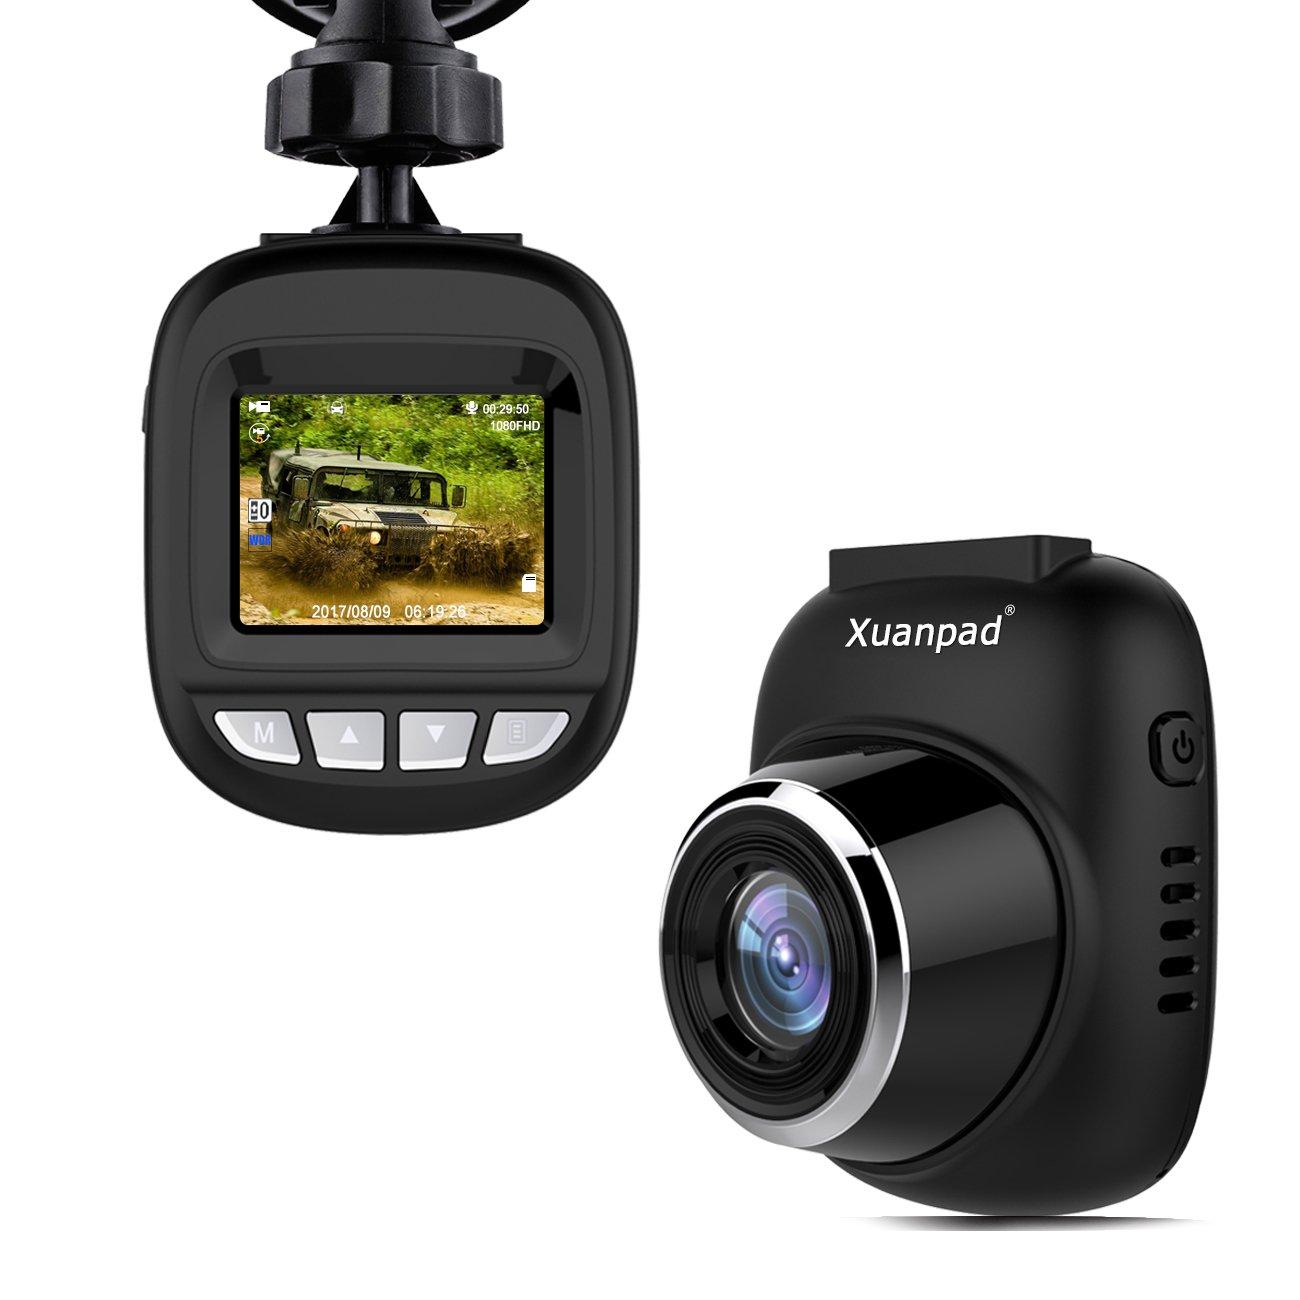 Xuanpad S3 Mini Dash Cam, Full HD 1080P Car Camera with 168° Wide Angle, G-sensor, Loop Recording Full HD 1080P Car Camera with 168° Wide Angle HHLX S3-UK1